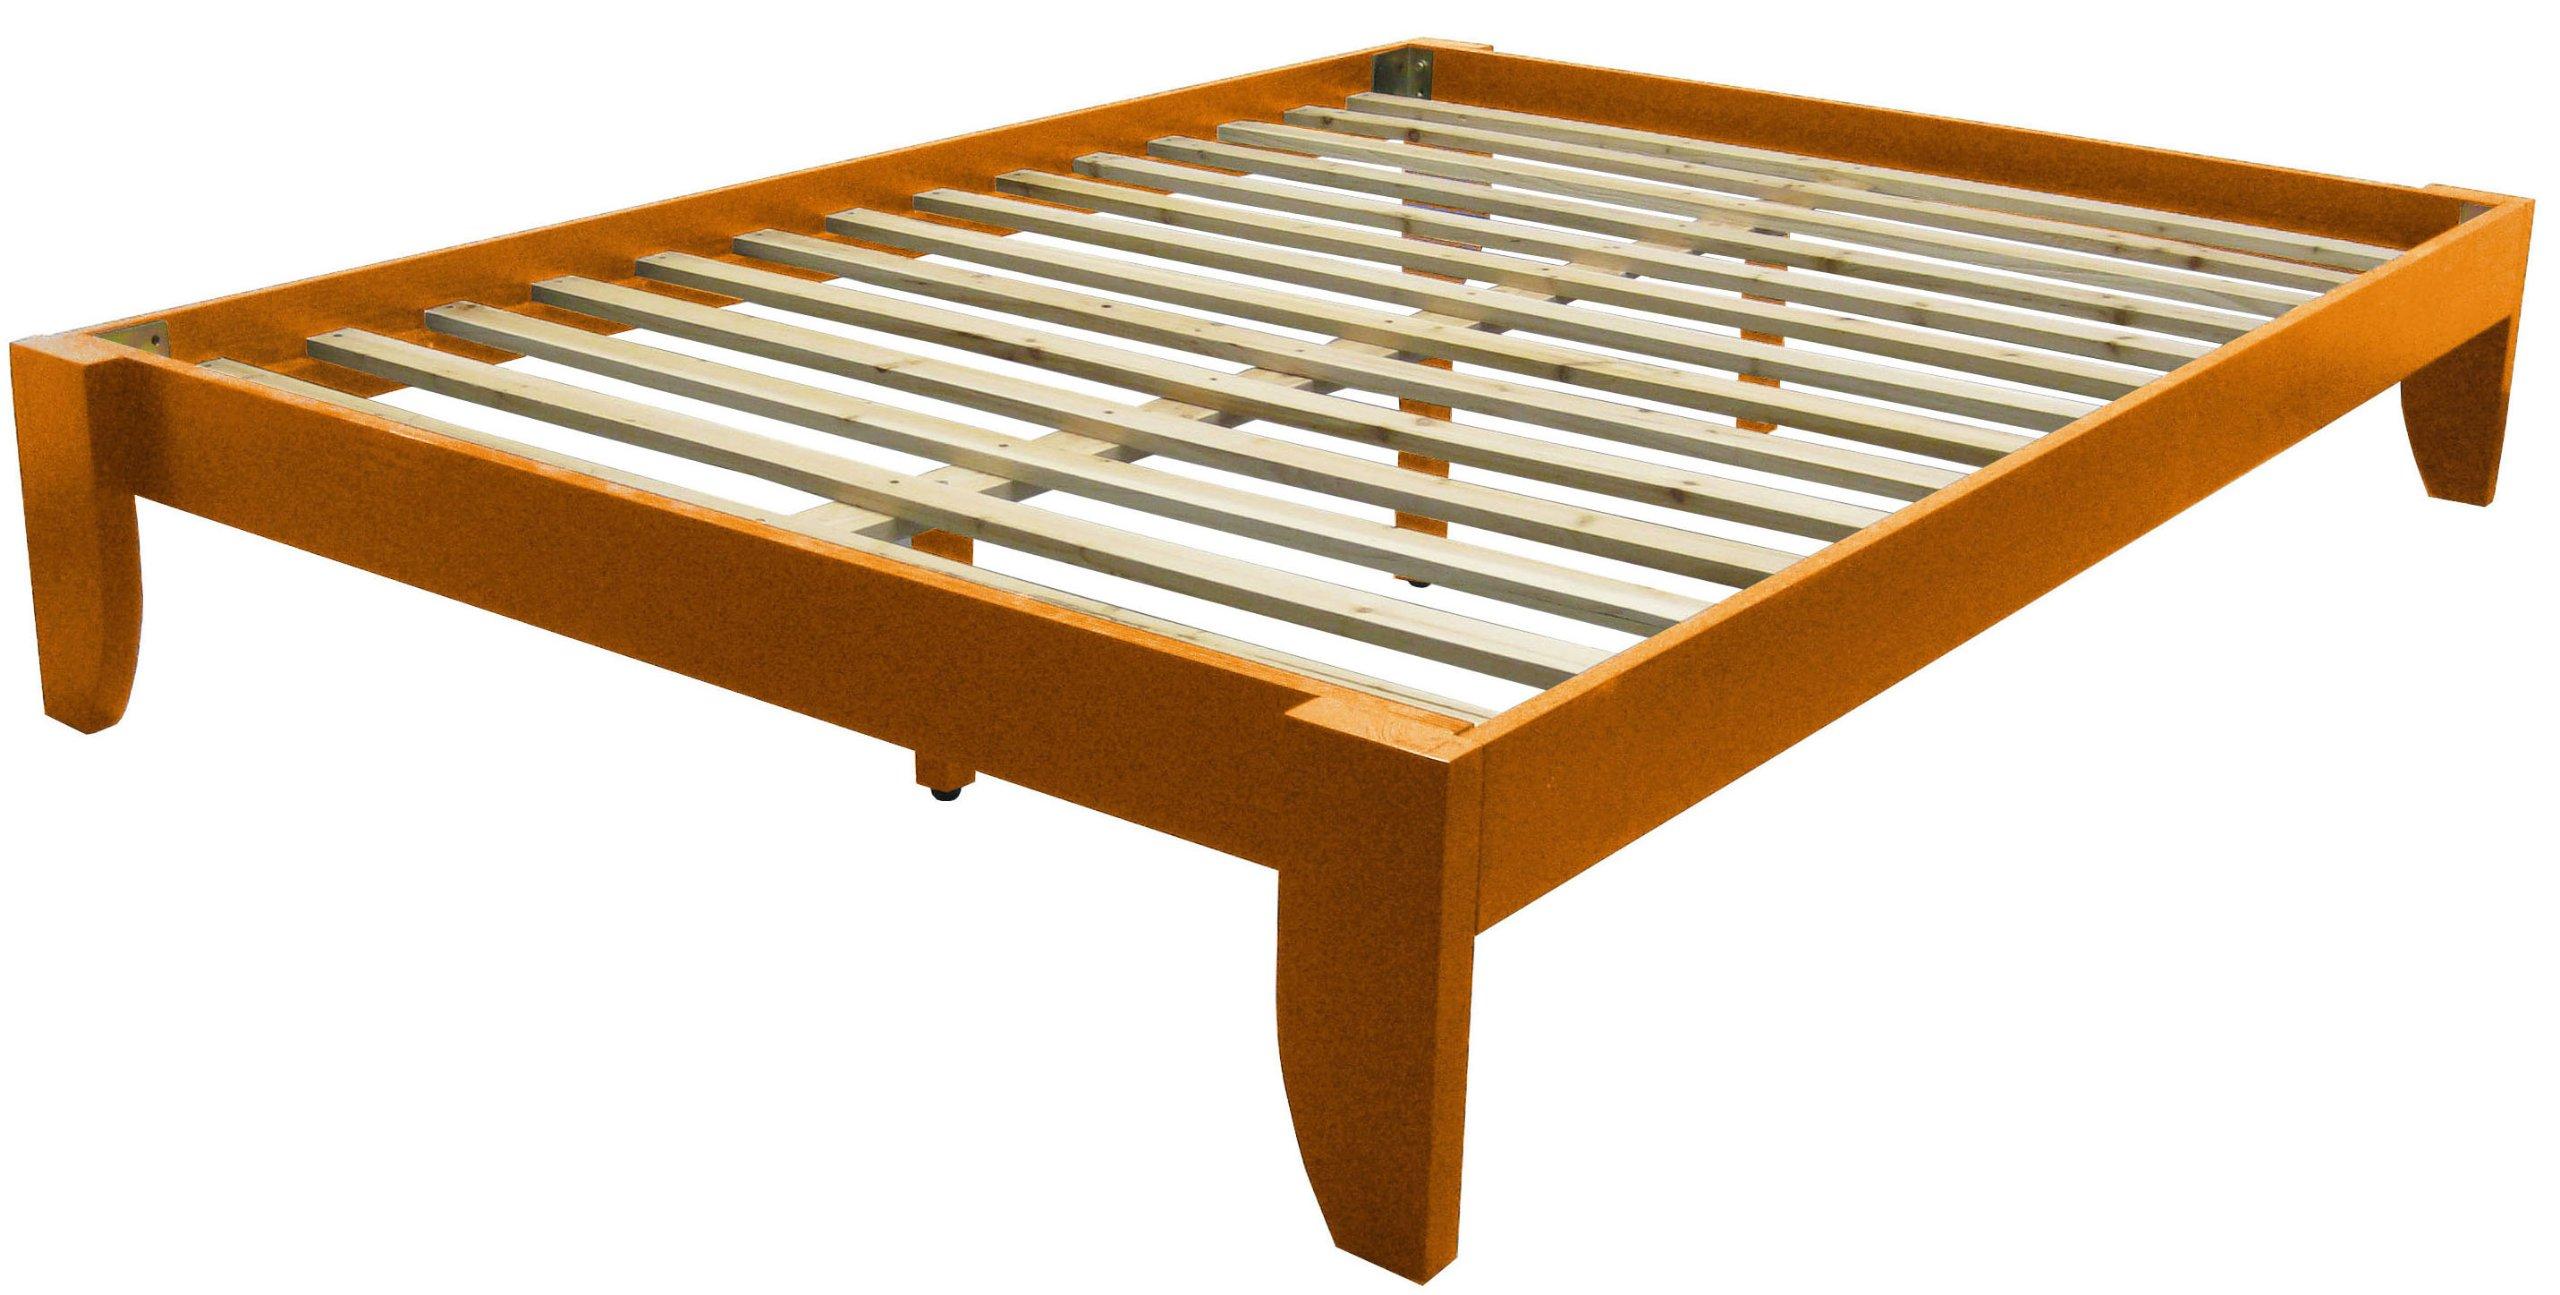 Epic Furnishings Copenhagen All Wood Platform Bed Frame, Full, Medium Oak by Epic Furnishings